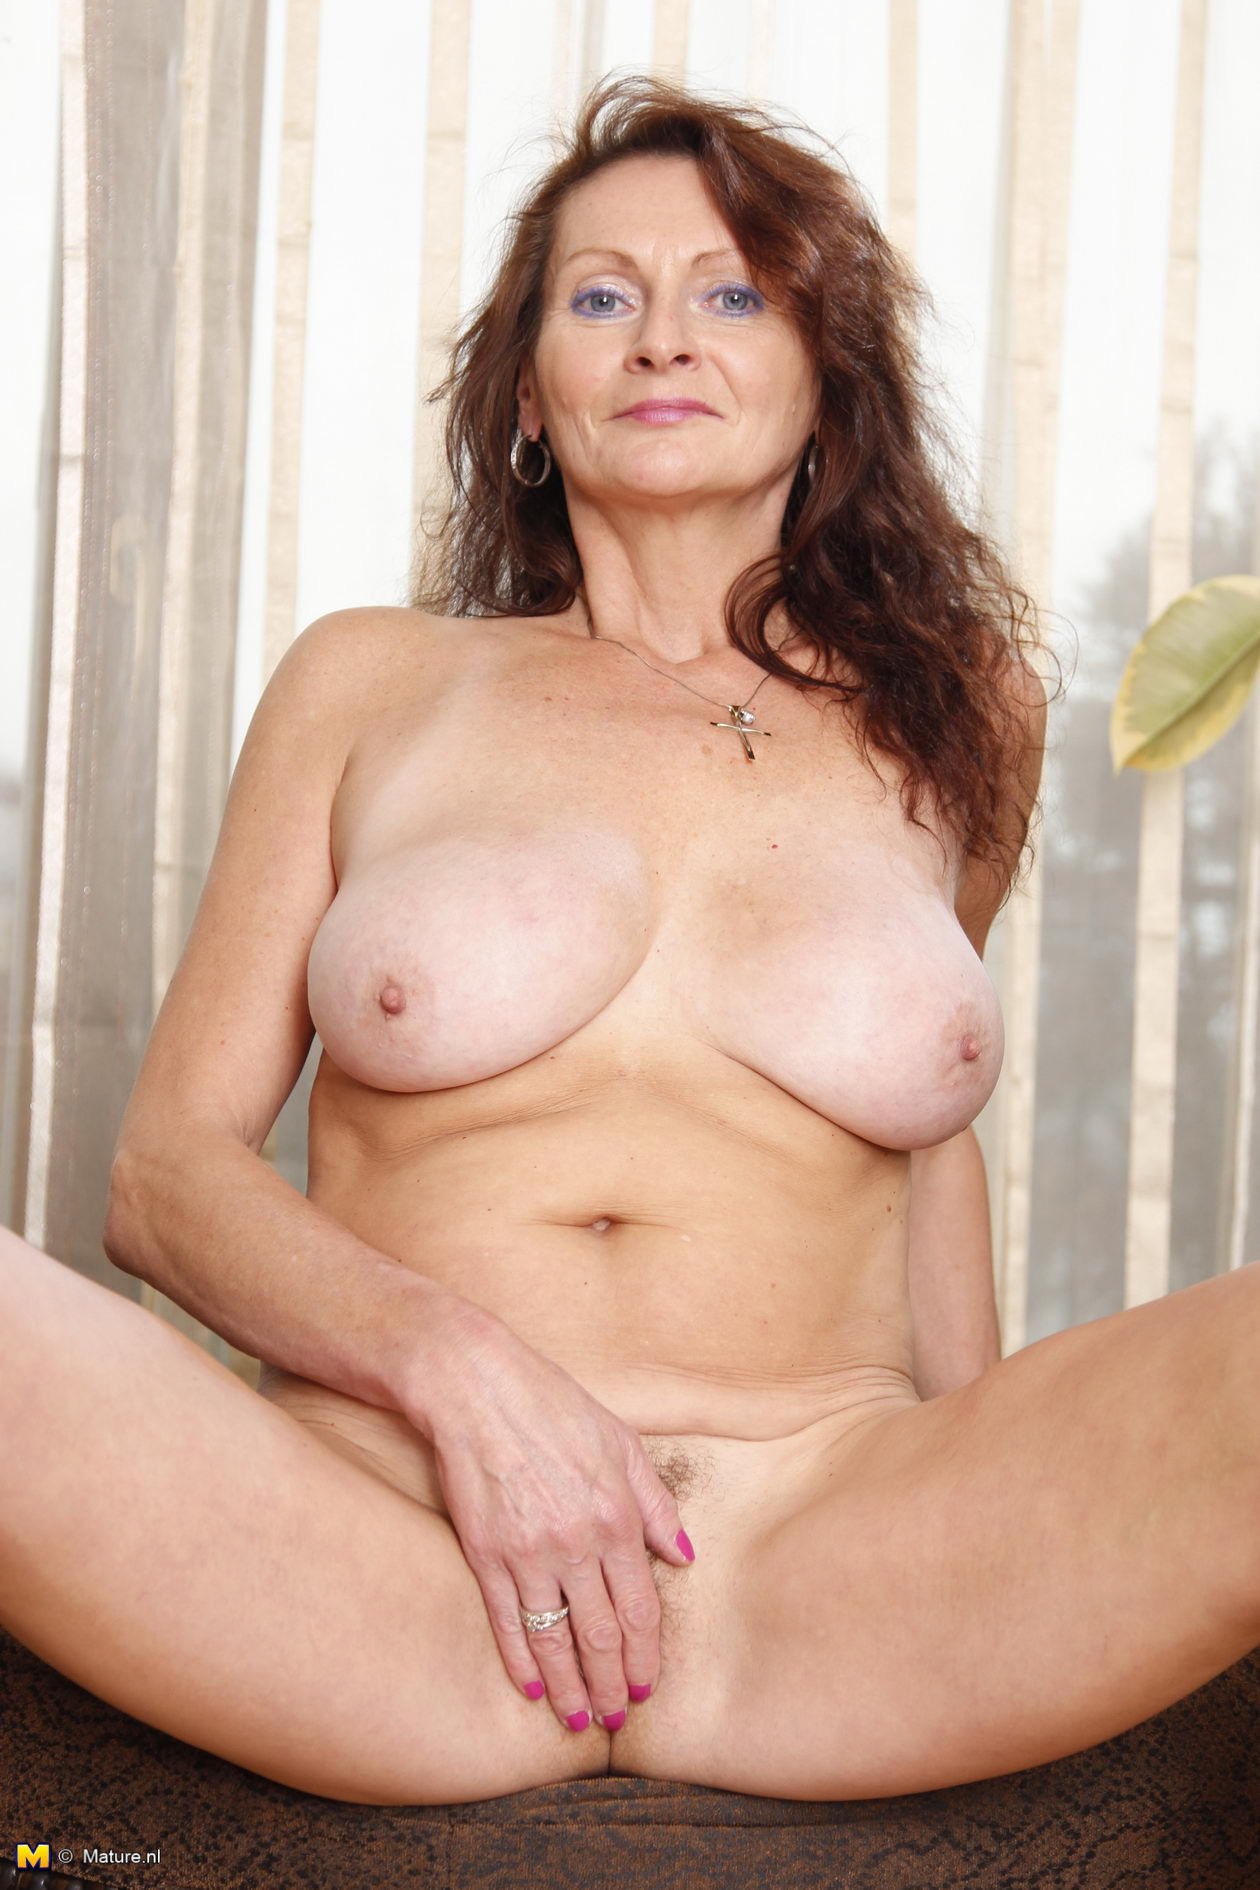 Boy mature pic woman